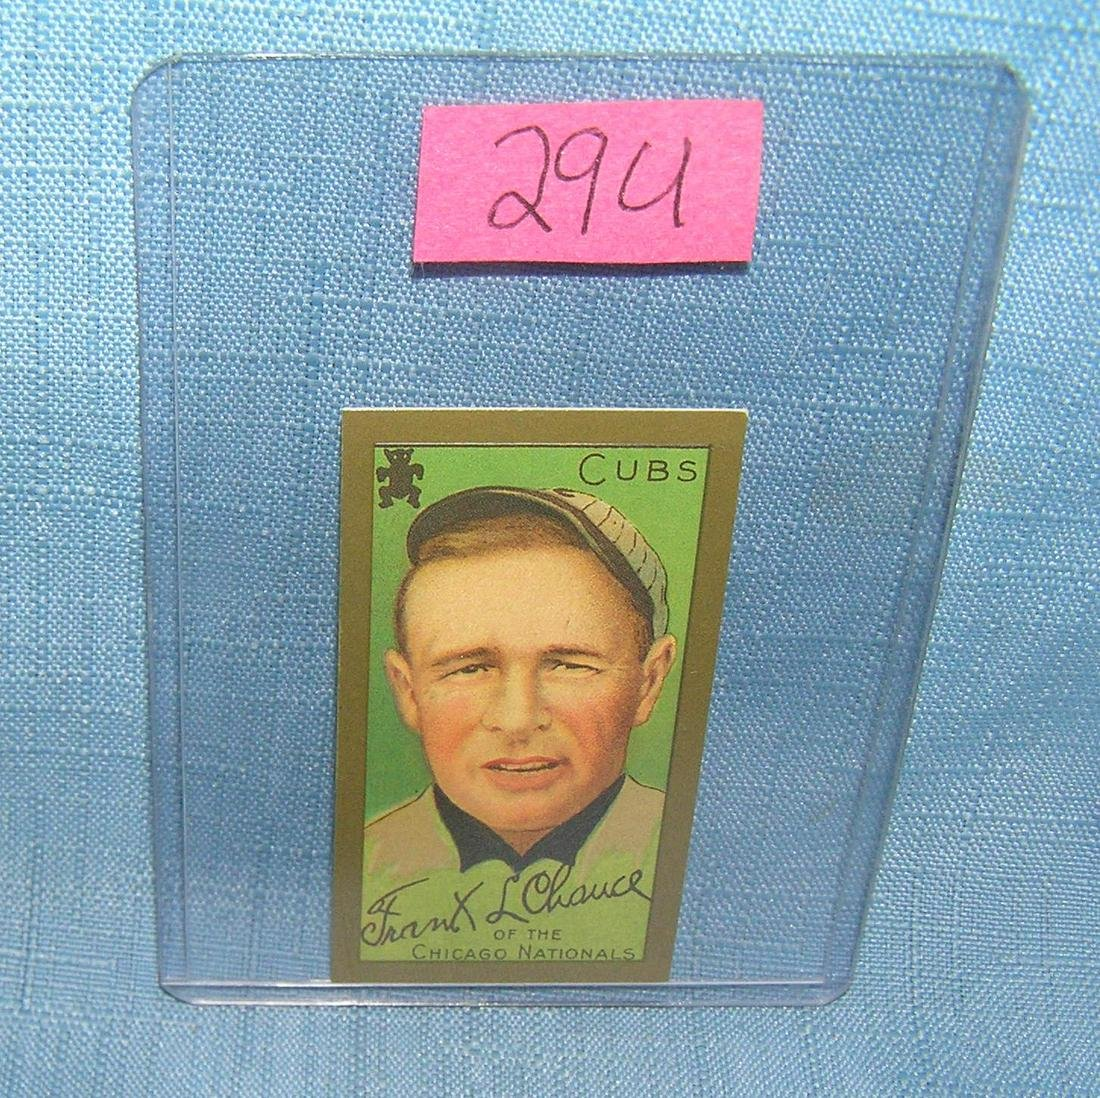 Frank L Chance reprint cigarette card